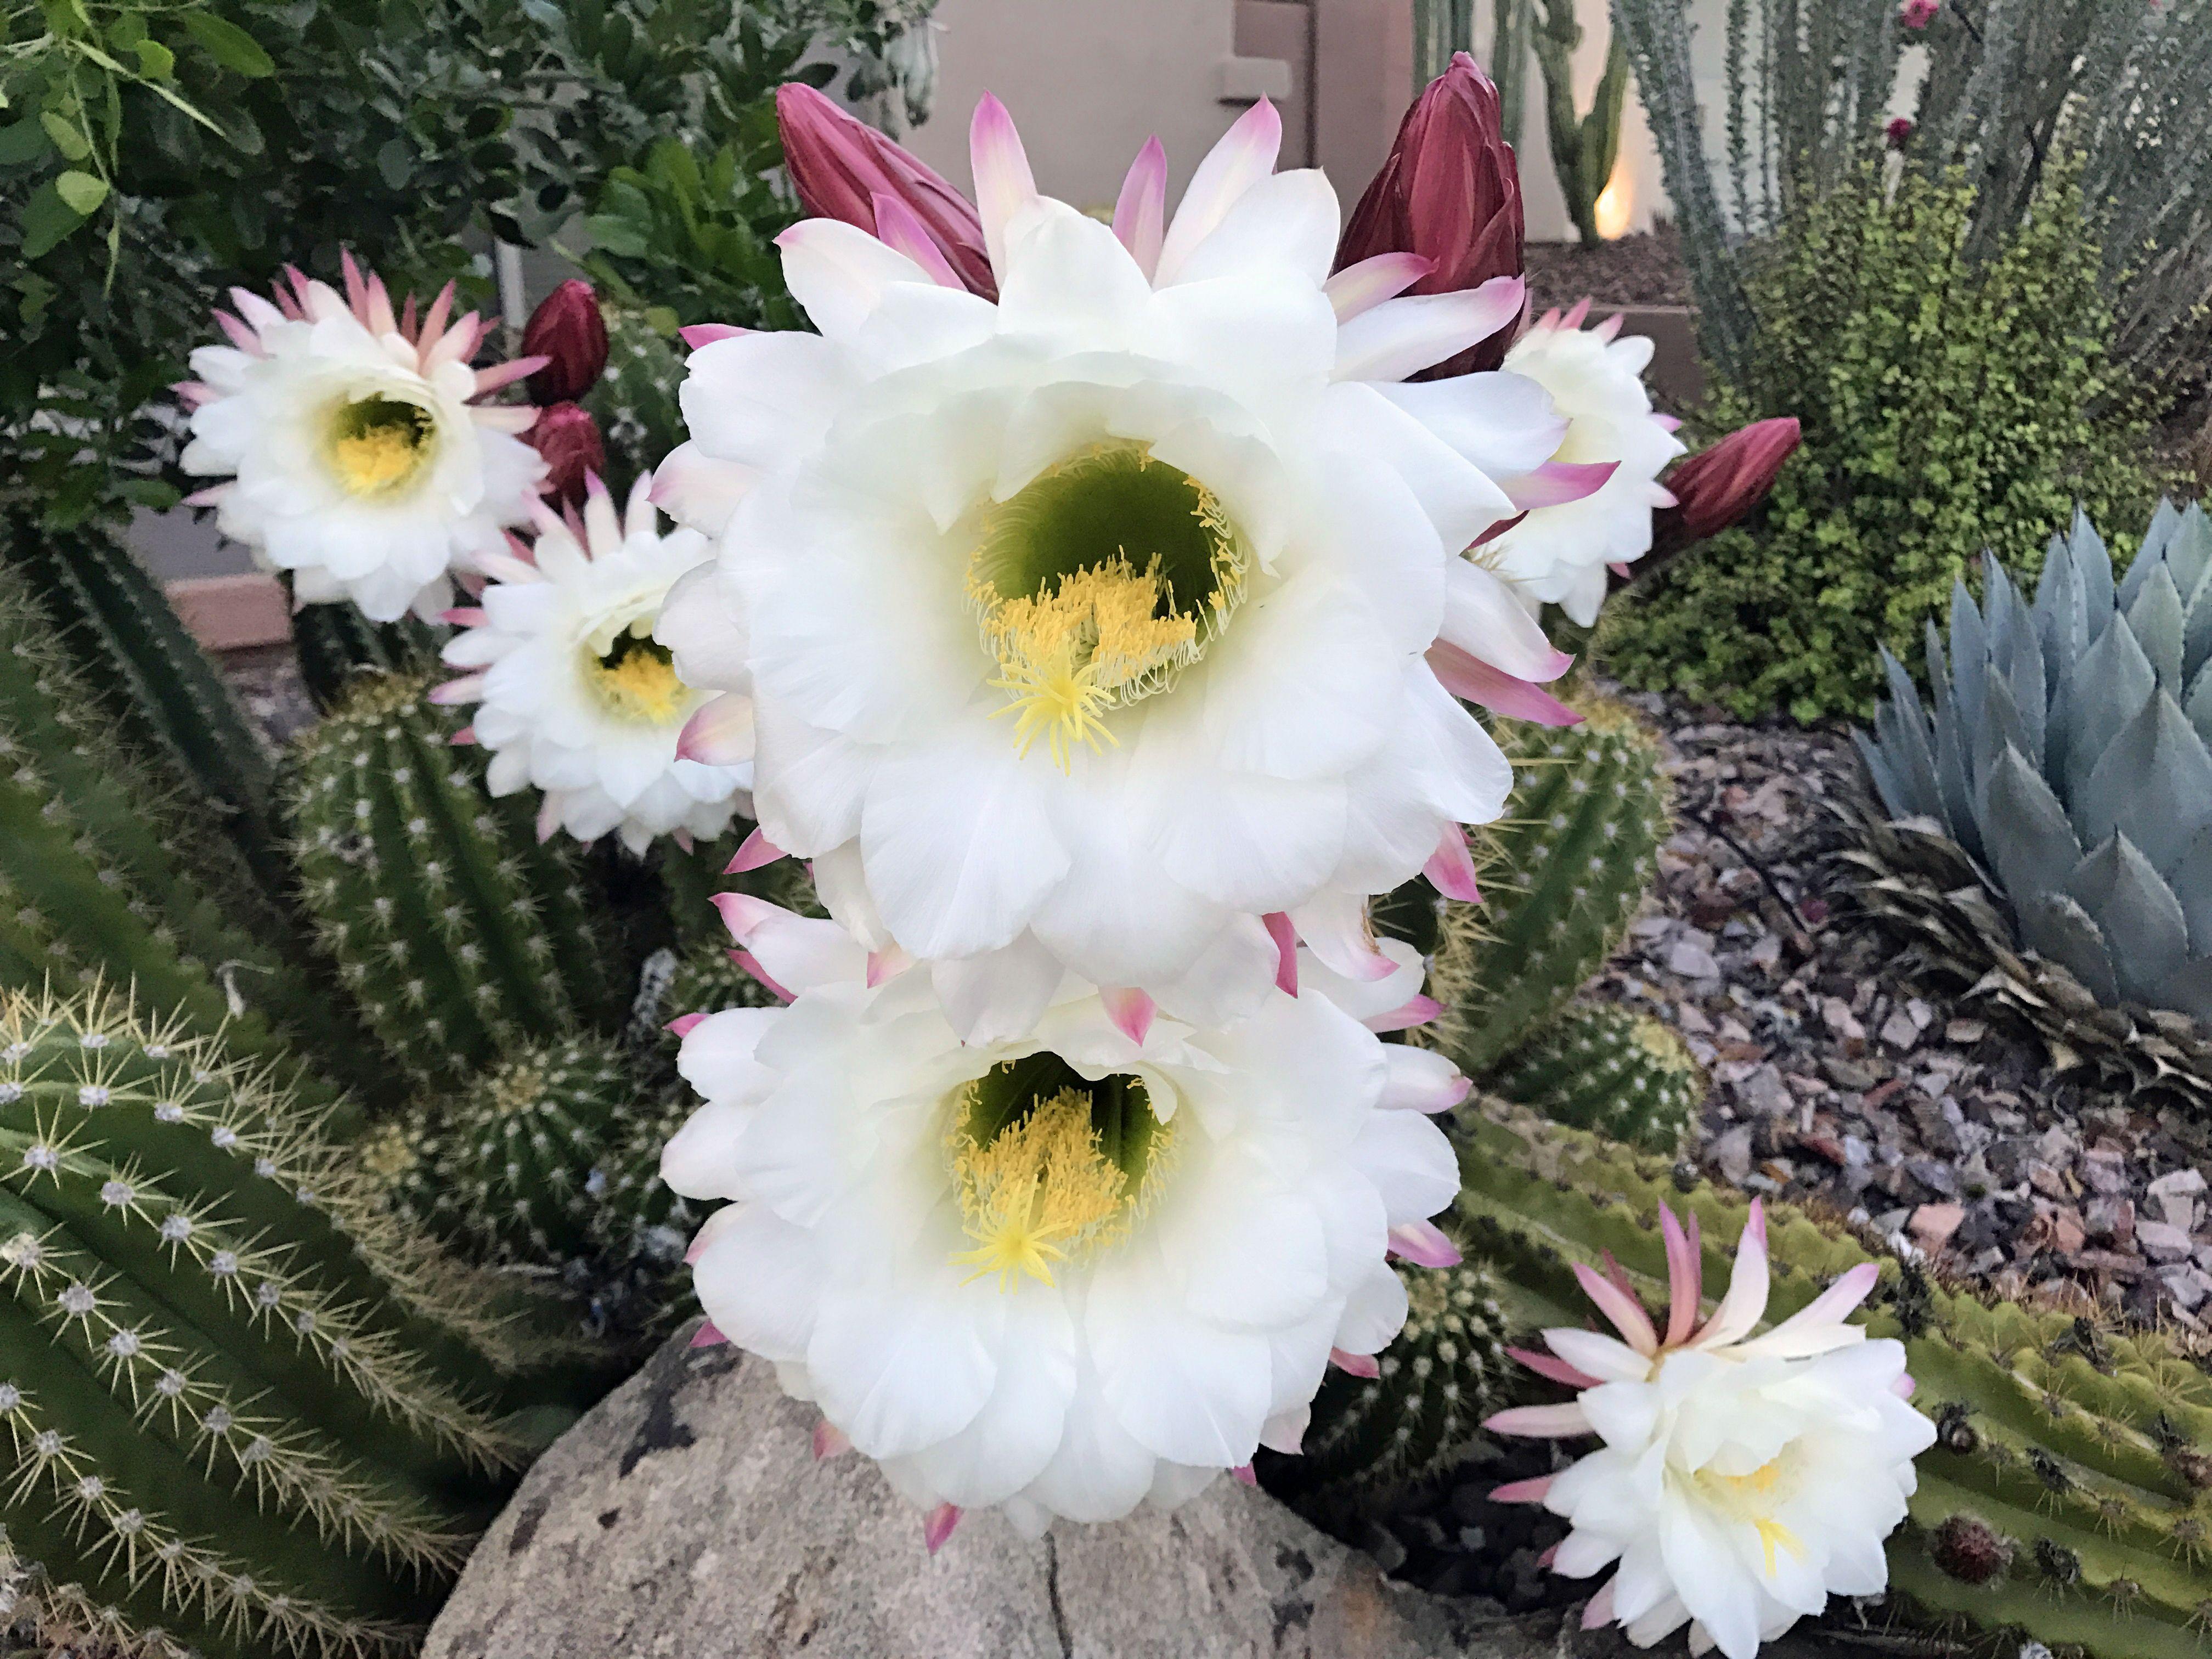 White And Pink Cactus Flowers Anthem Arizona Garden Pinterest